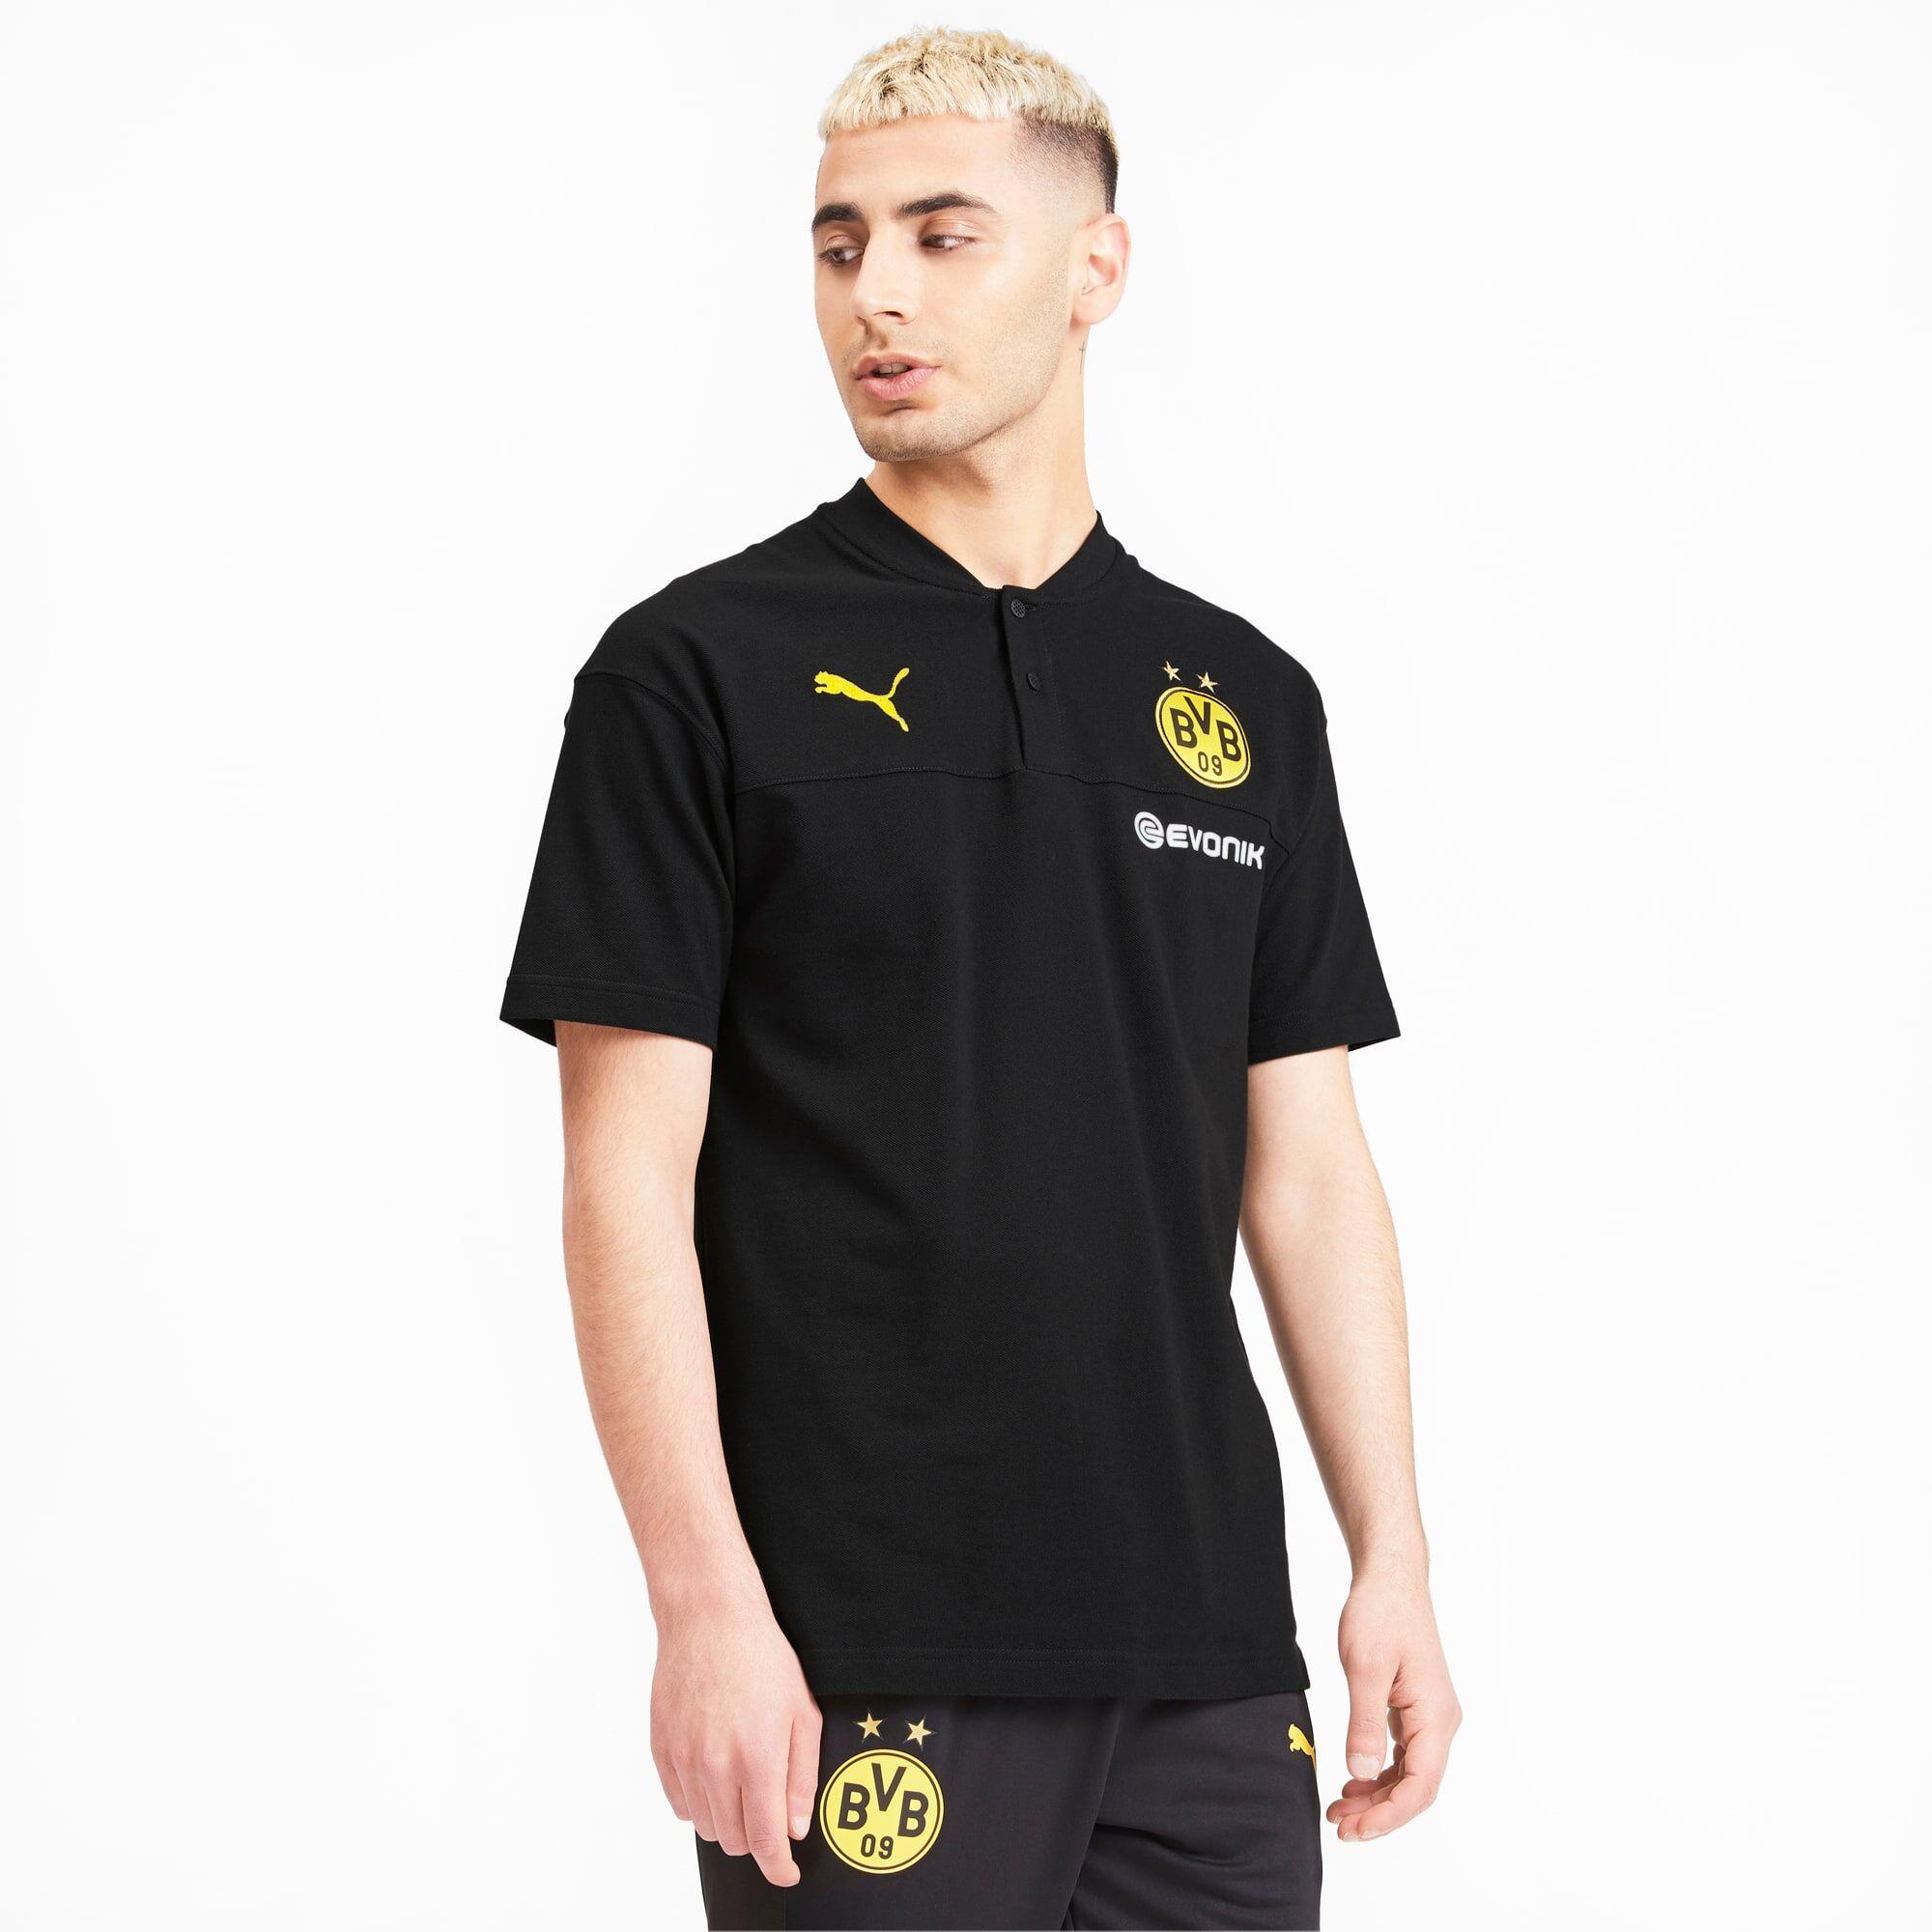 Puma BVB Casuals Men's Polo Shirt,  Black/Phantom Black, size 3X Large, Clothing